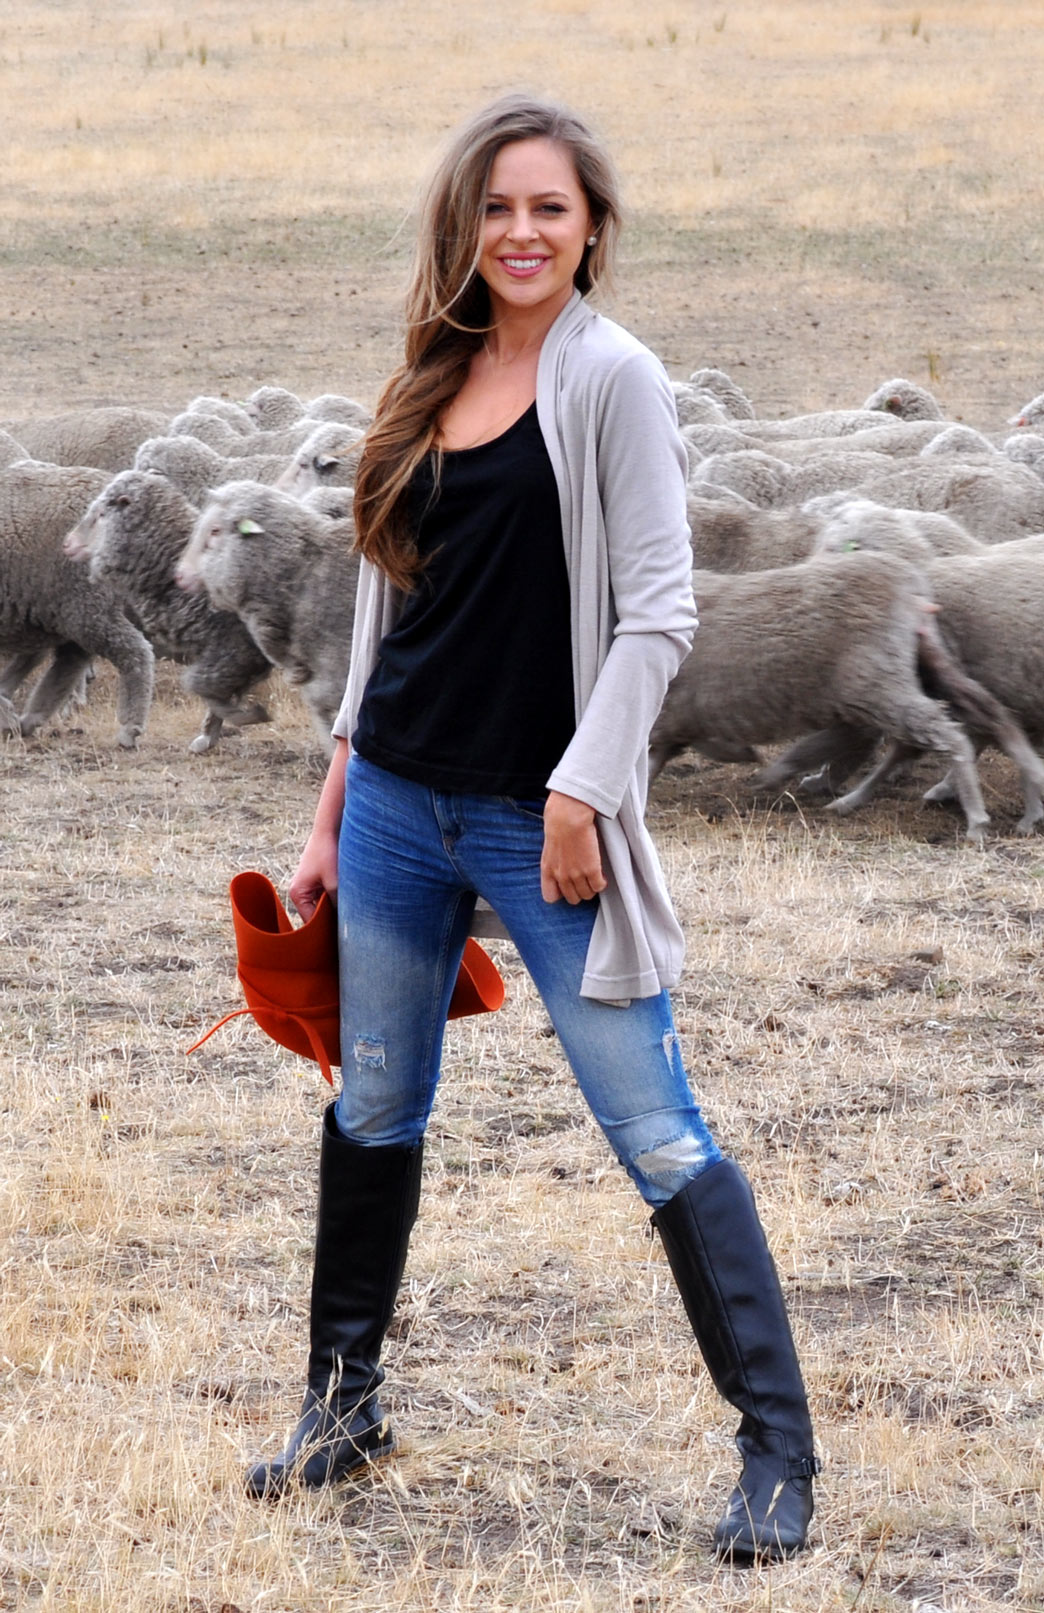 Drape Cardigan - Women's Stone Wool Drape Cardigan with no buttons or fastenings - Smitten Merino Tasmania Australia